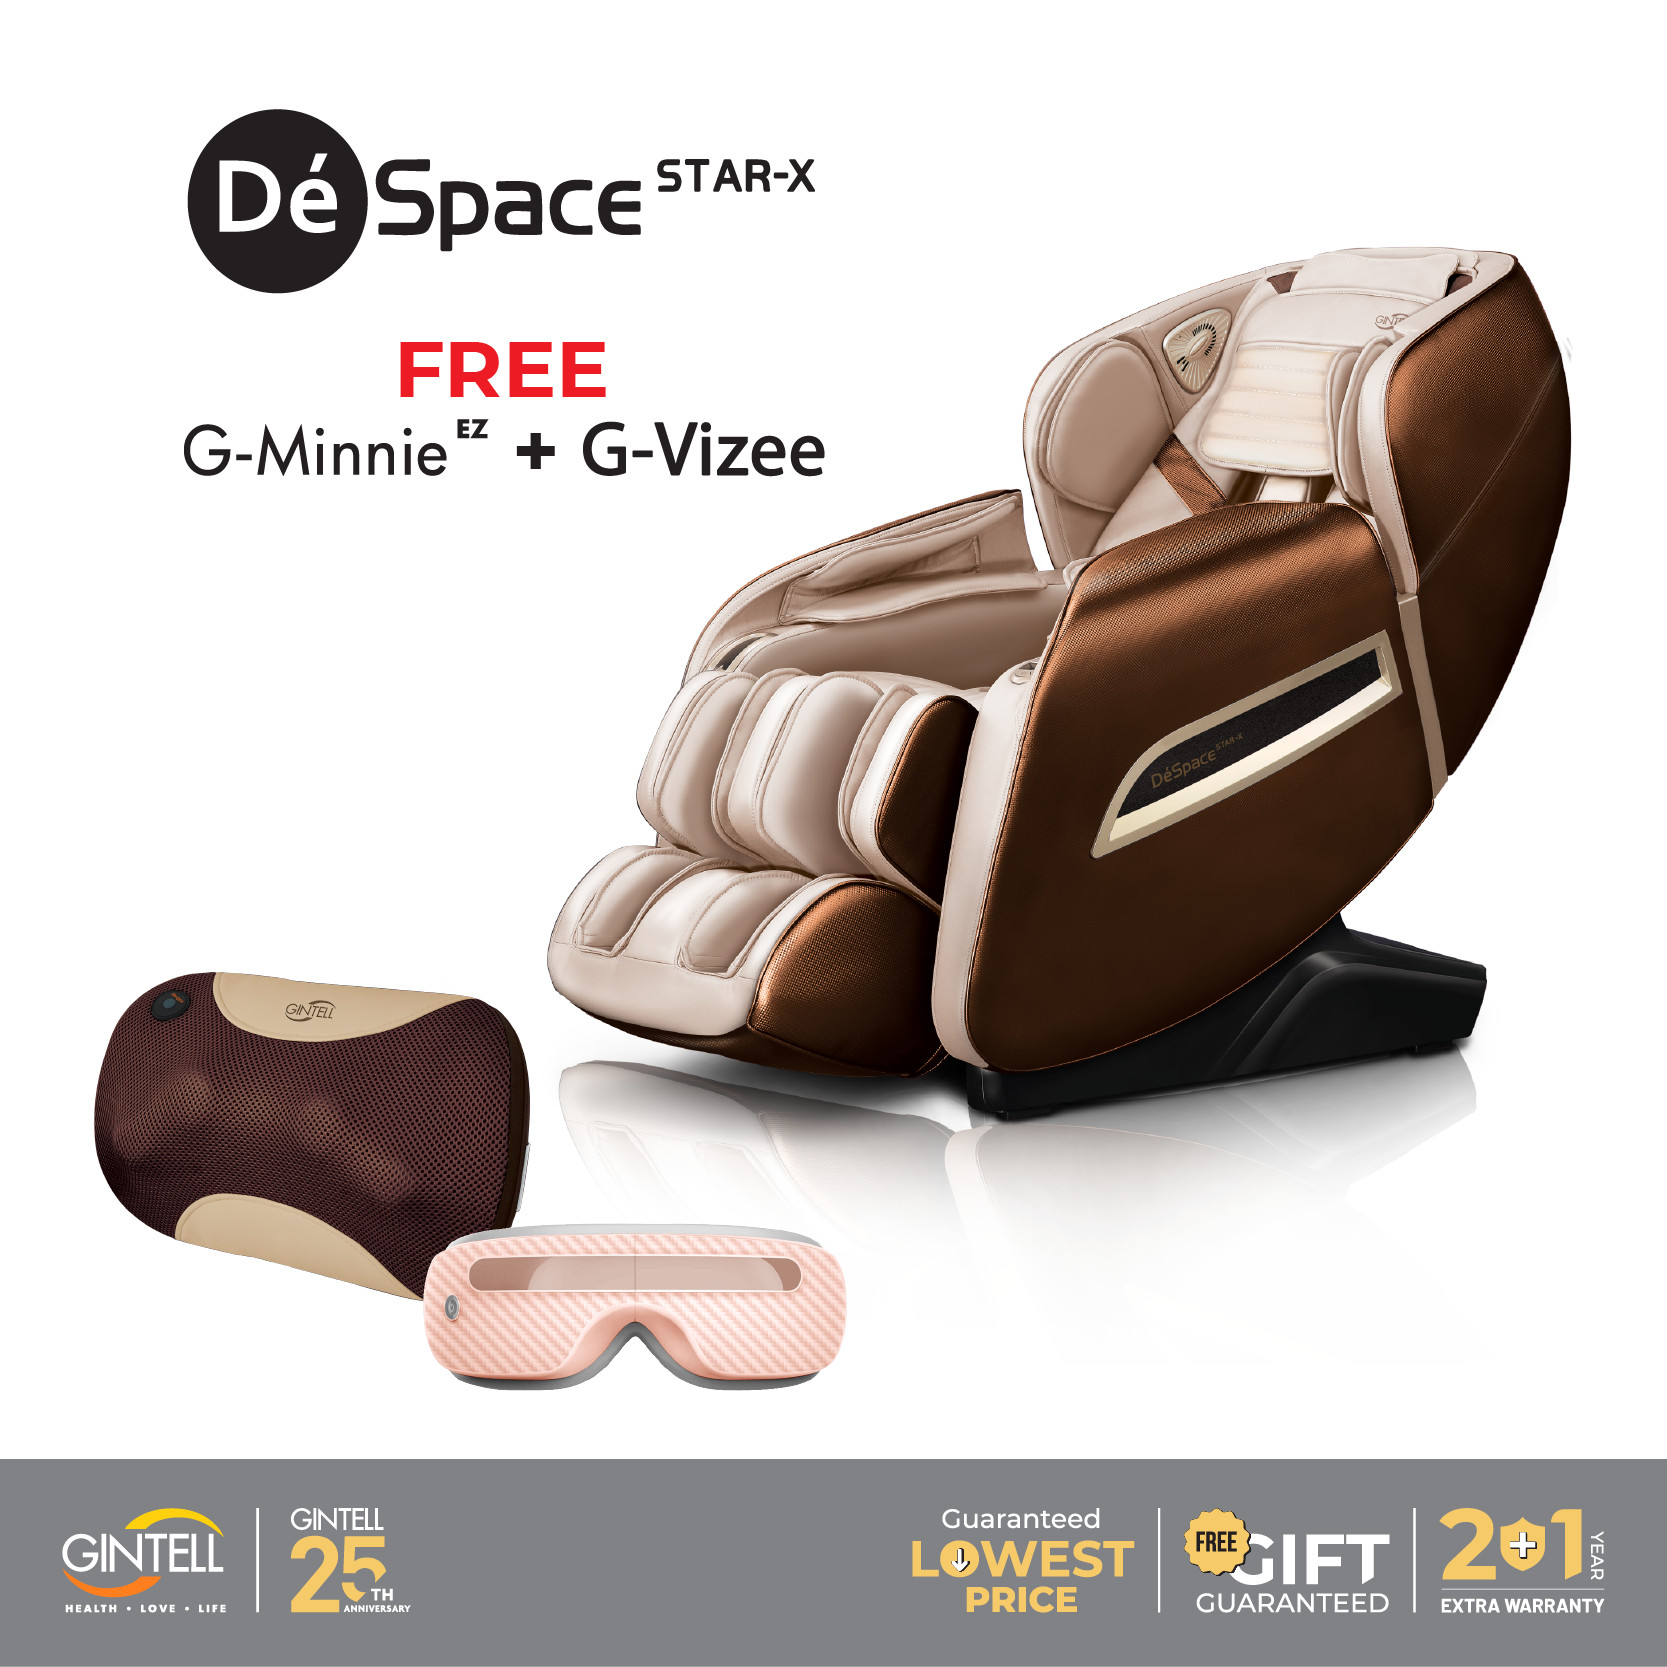 Ghế Massage Gintell DéSpace STAR-X [Tặng ngay] Máy Massage Mắt G-VIZEE + Đệm Massage G-Minnie EZ